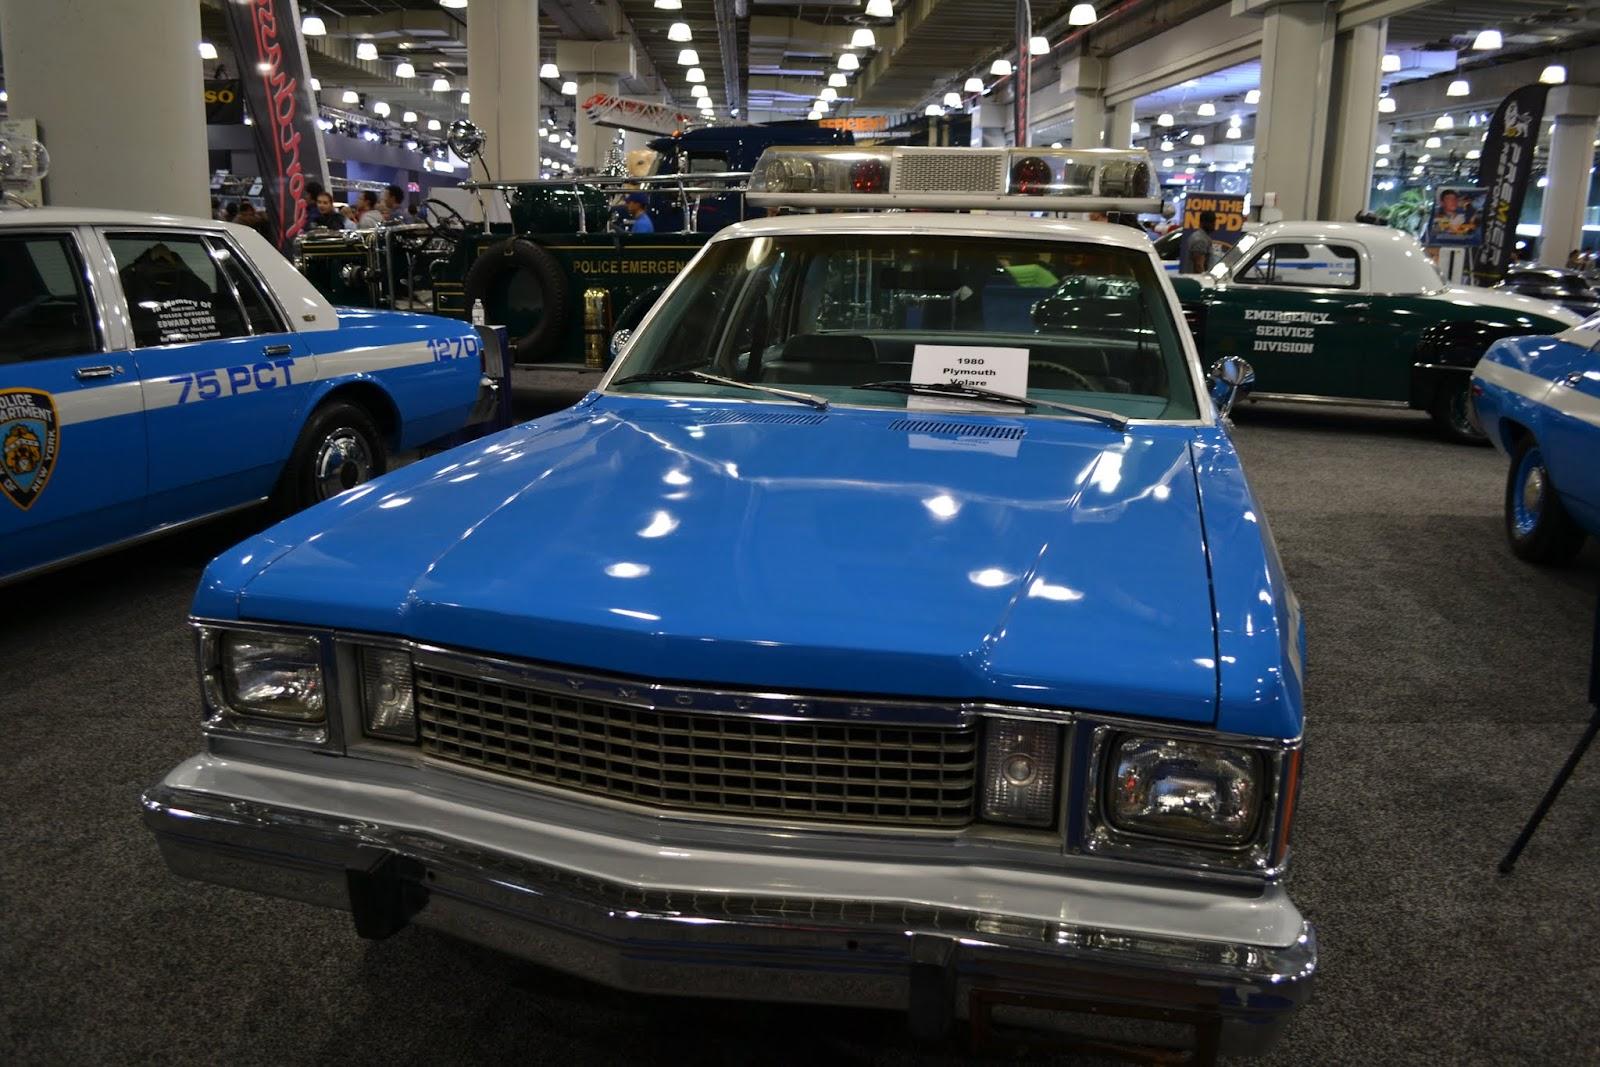 Plymouth Volare 1, 1980 года. Ежегодное автошоу в Нью-Йорке - 2015 (New York International Auto Show - 2015)